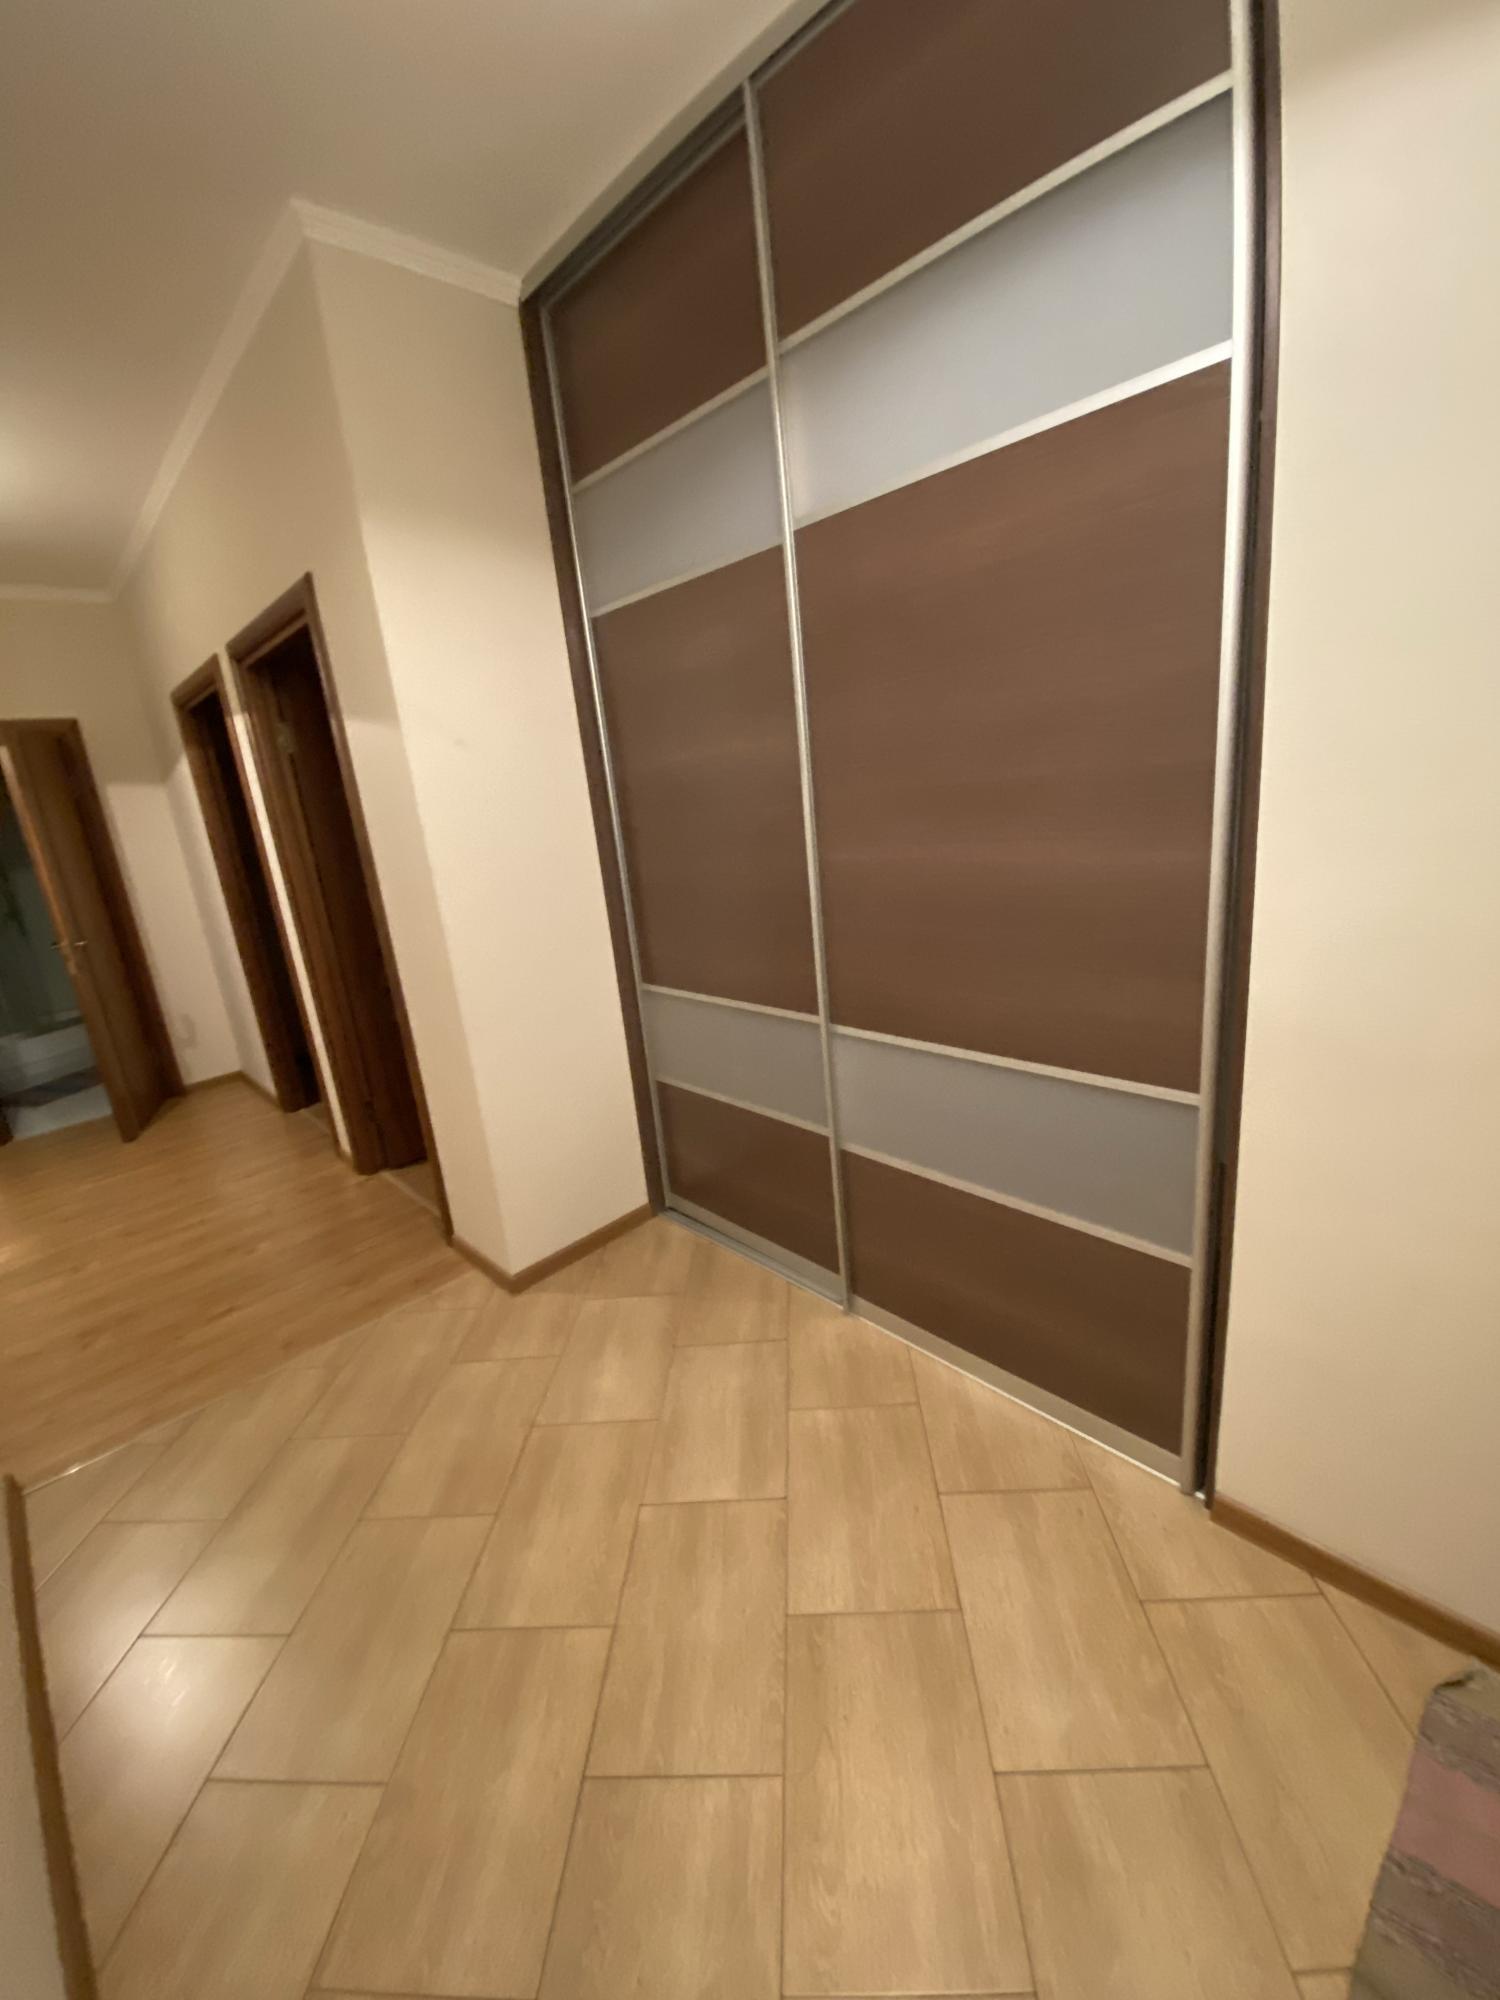 2к квартира Капитанская улица, 6 | 30000 | аренда в Красноярске фото 8